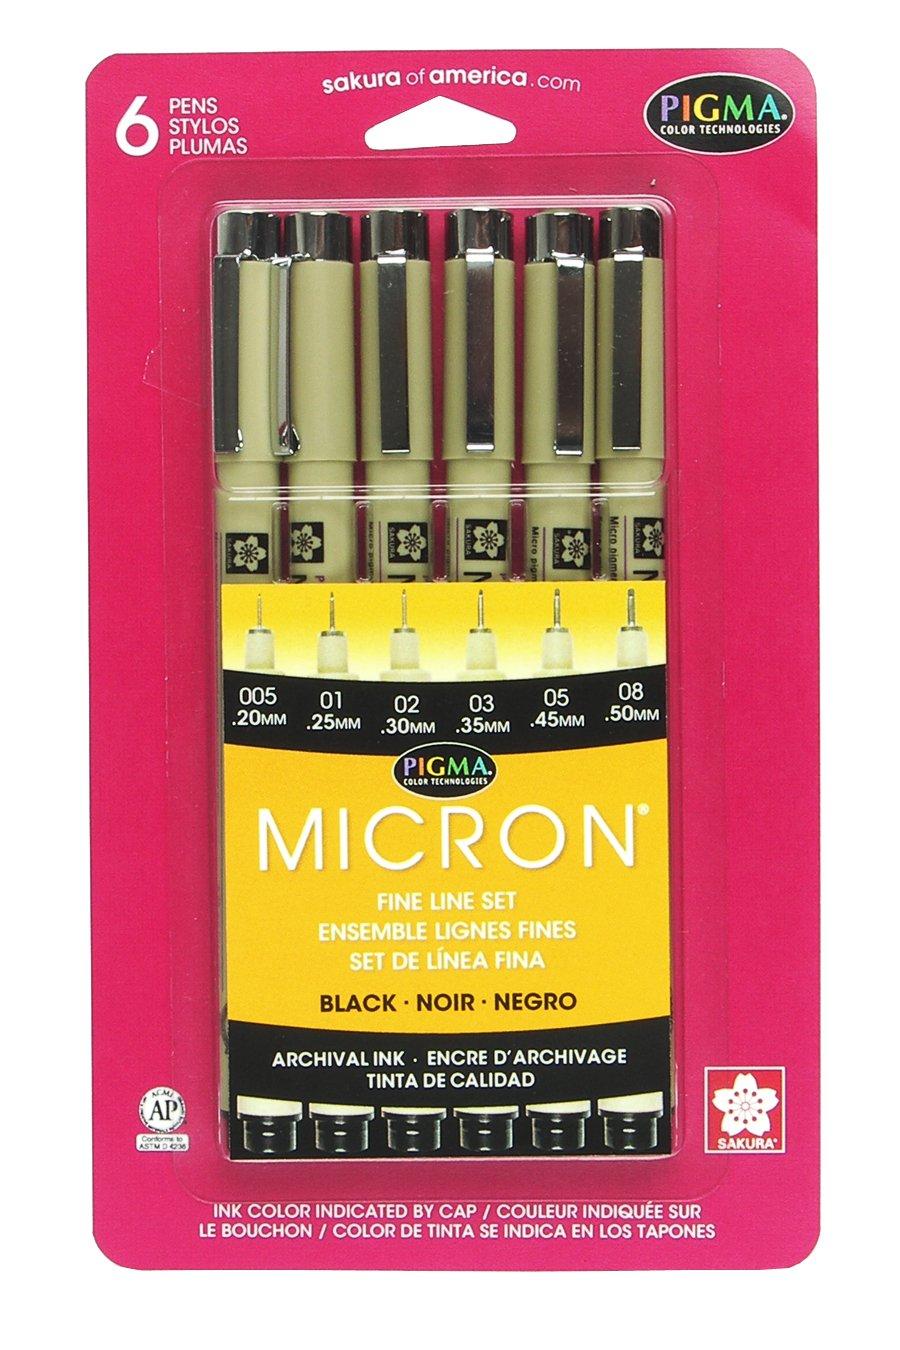 Sakura Pigma 30062 Micron Blister Card Ink Pen Set, Black, Ass't Point Sizes 6CT Set by Sakura (Image #1)